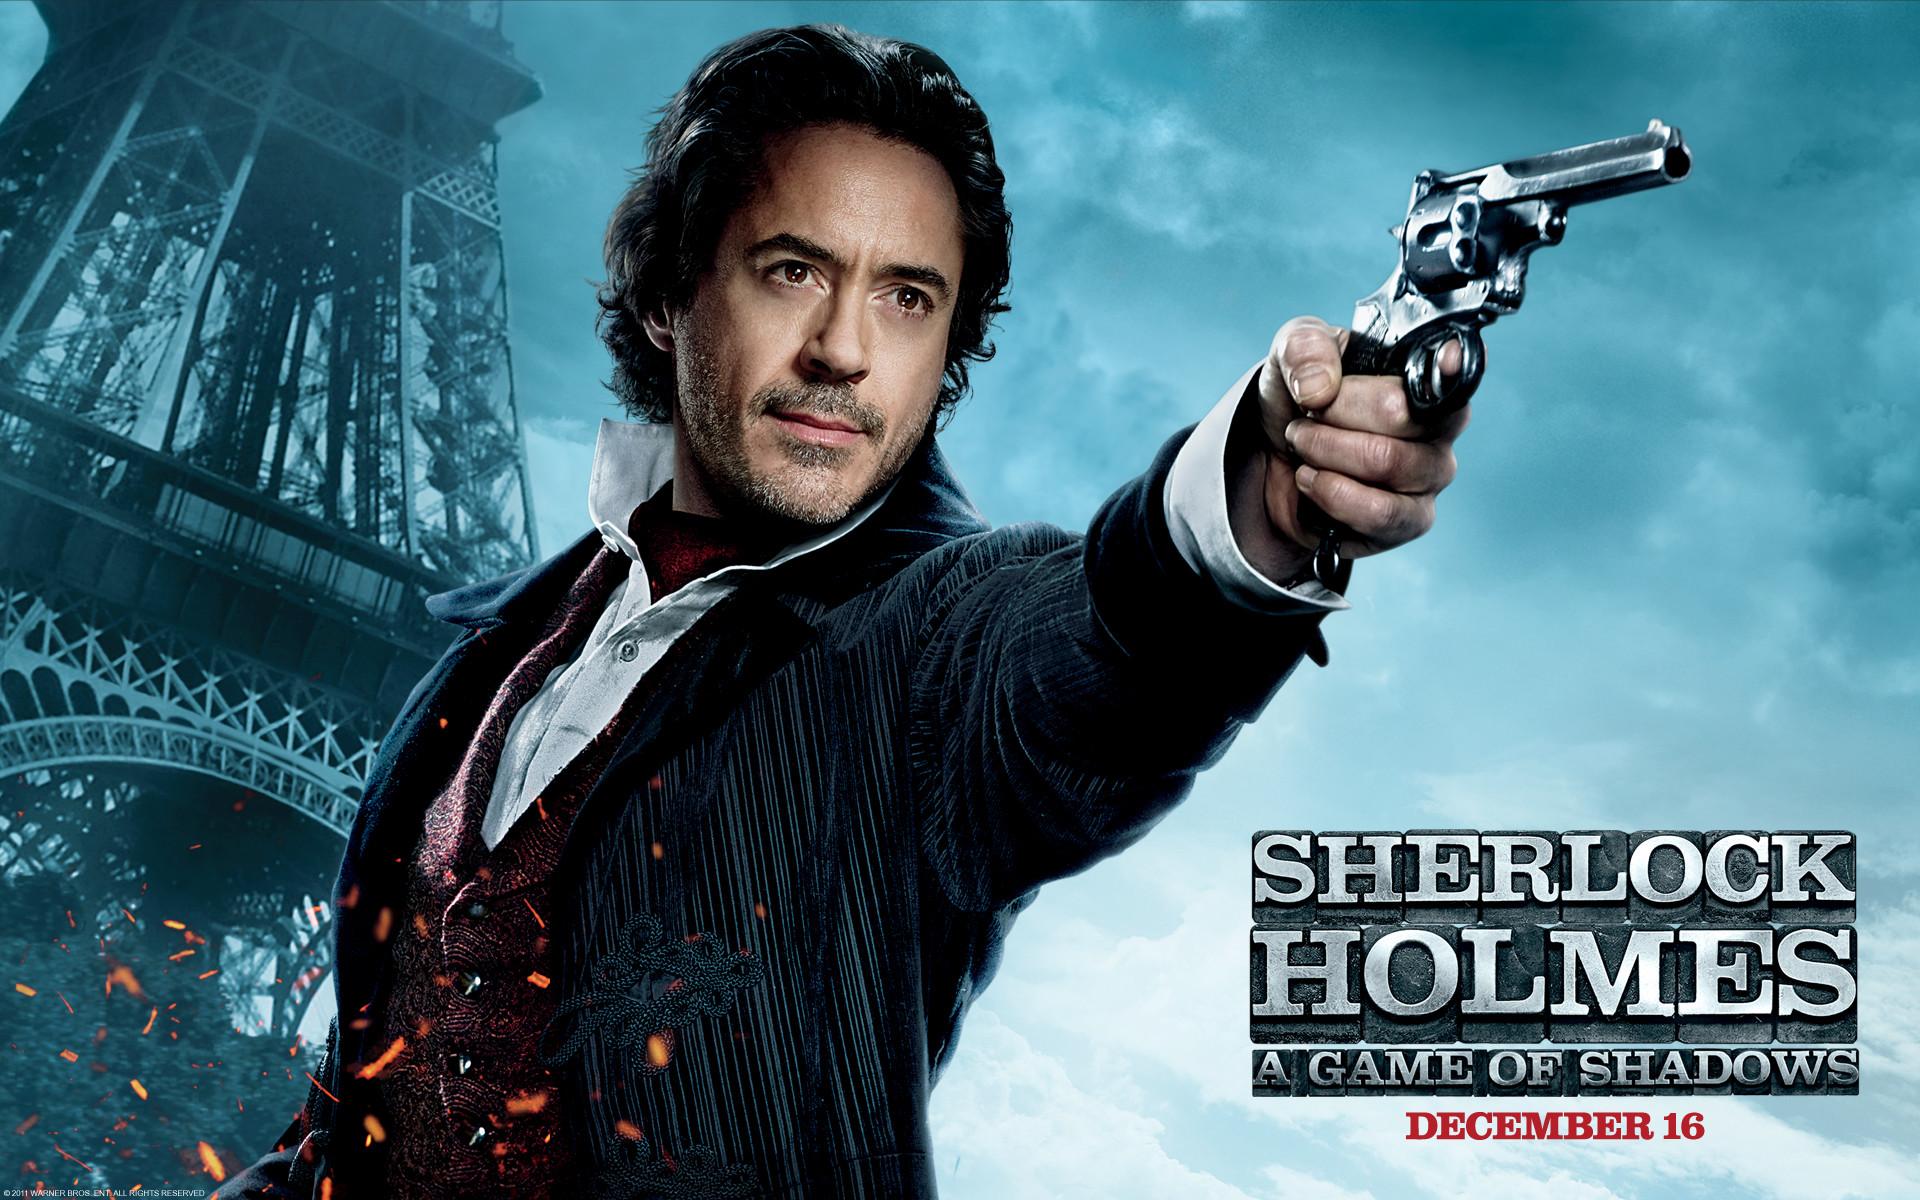 Robert Downey Jr Sherlock Holmes Wallpaper (74+ images)